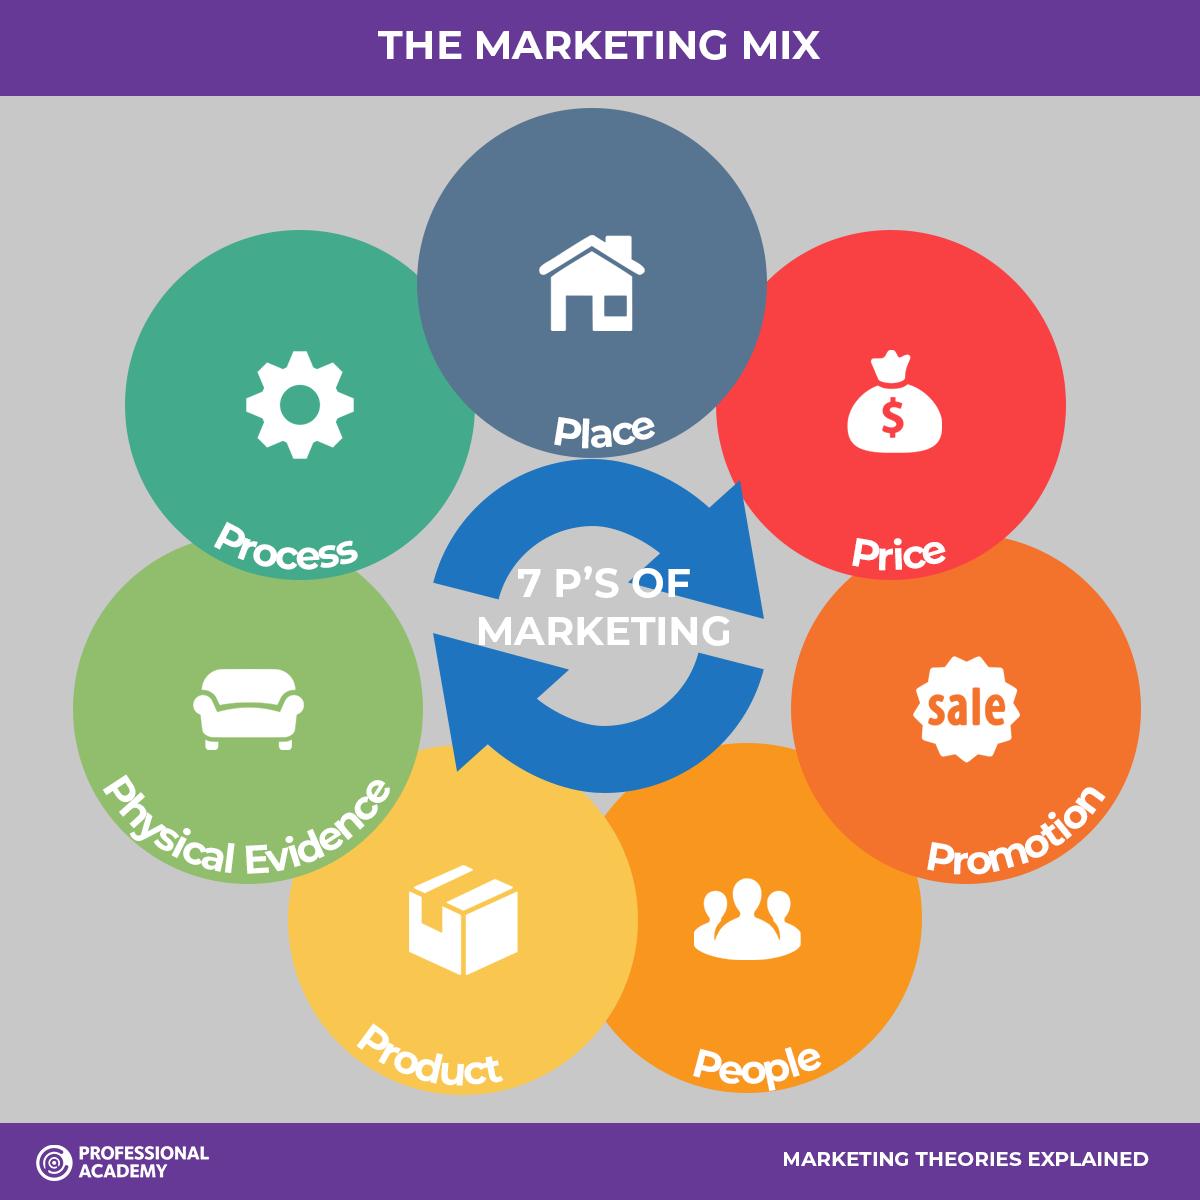 The Marketing Mix 7 Ps of Marketing